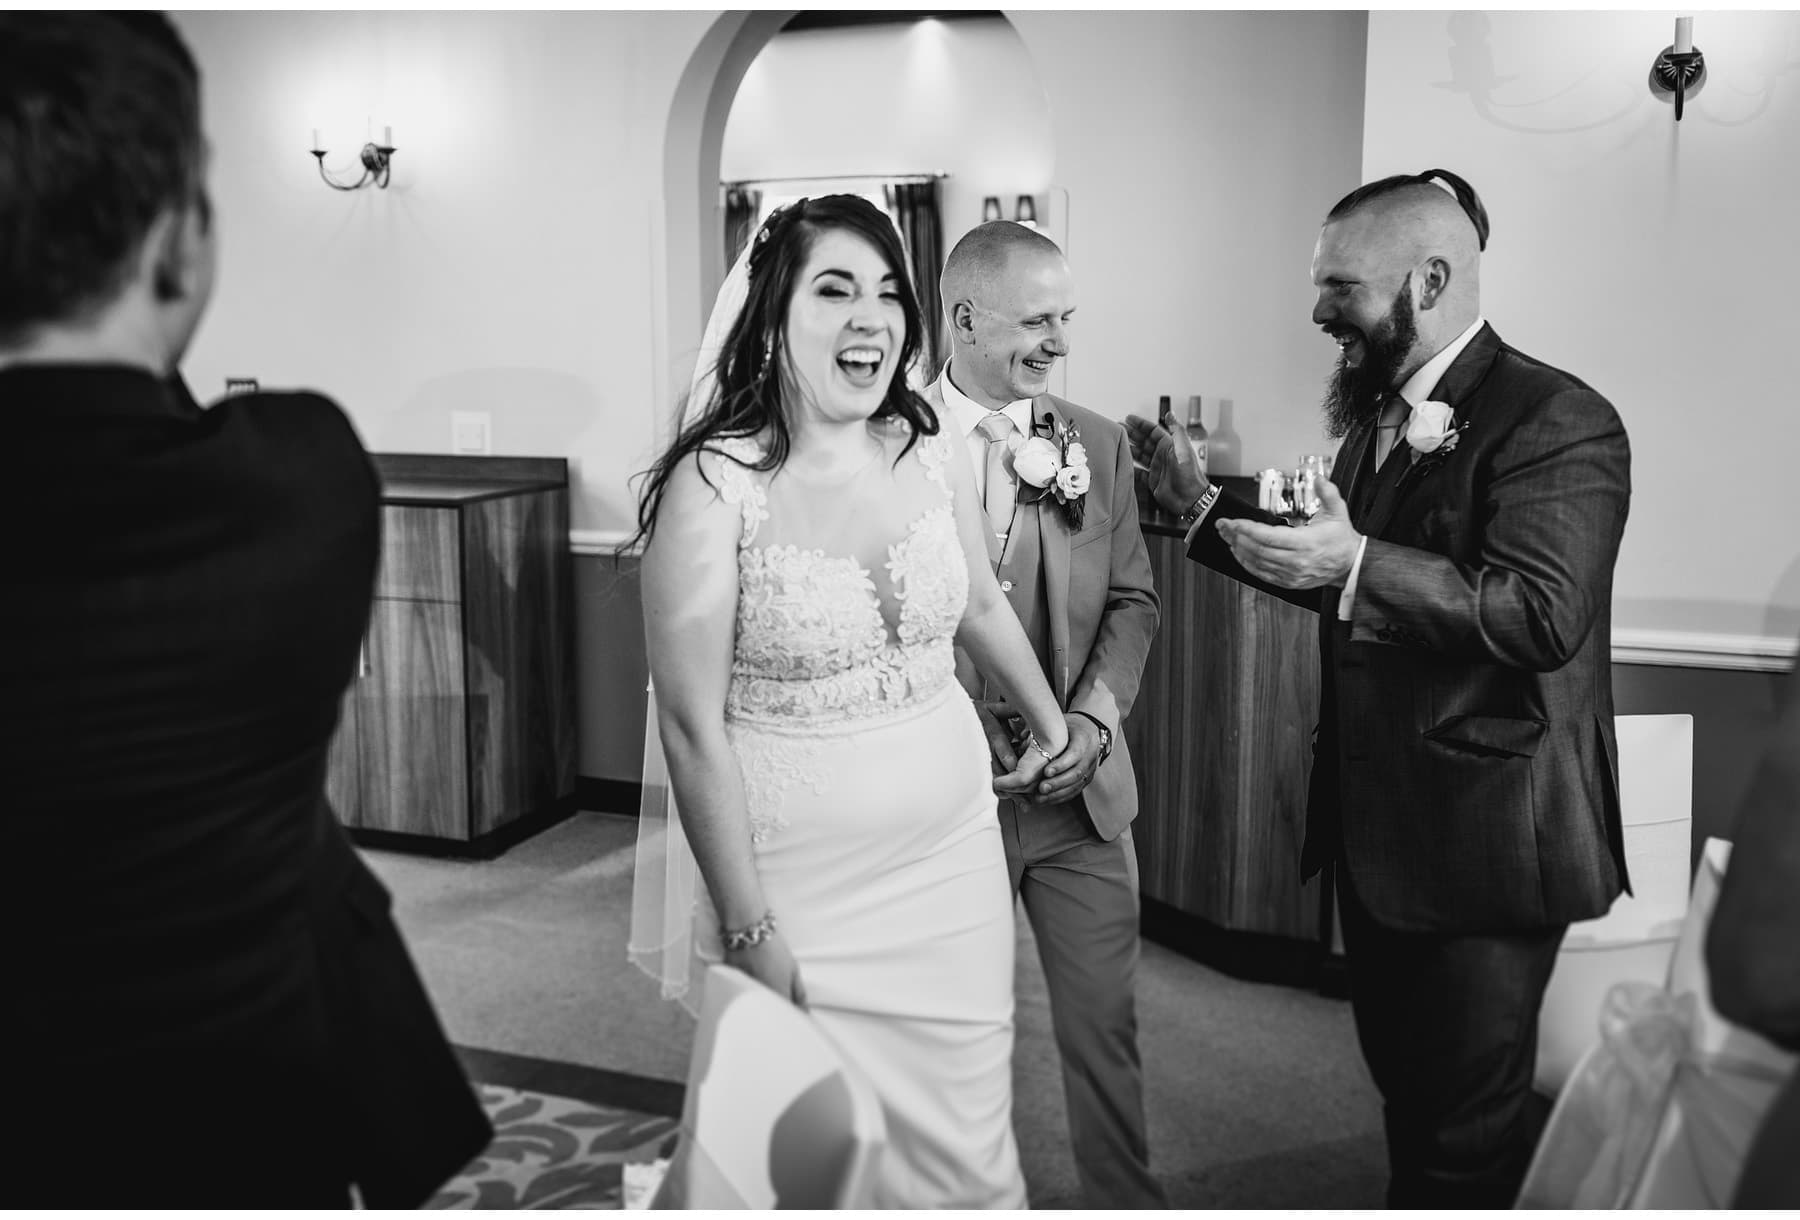 the bride & groom walking into their wedding breakfast